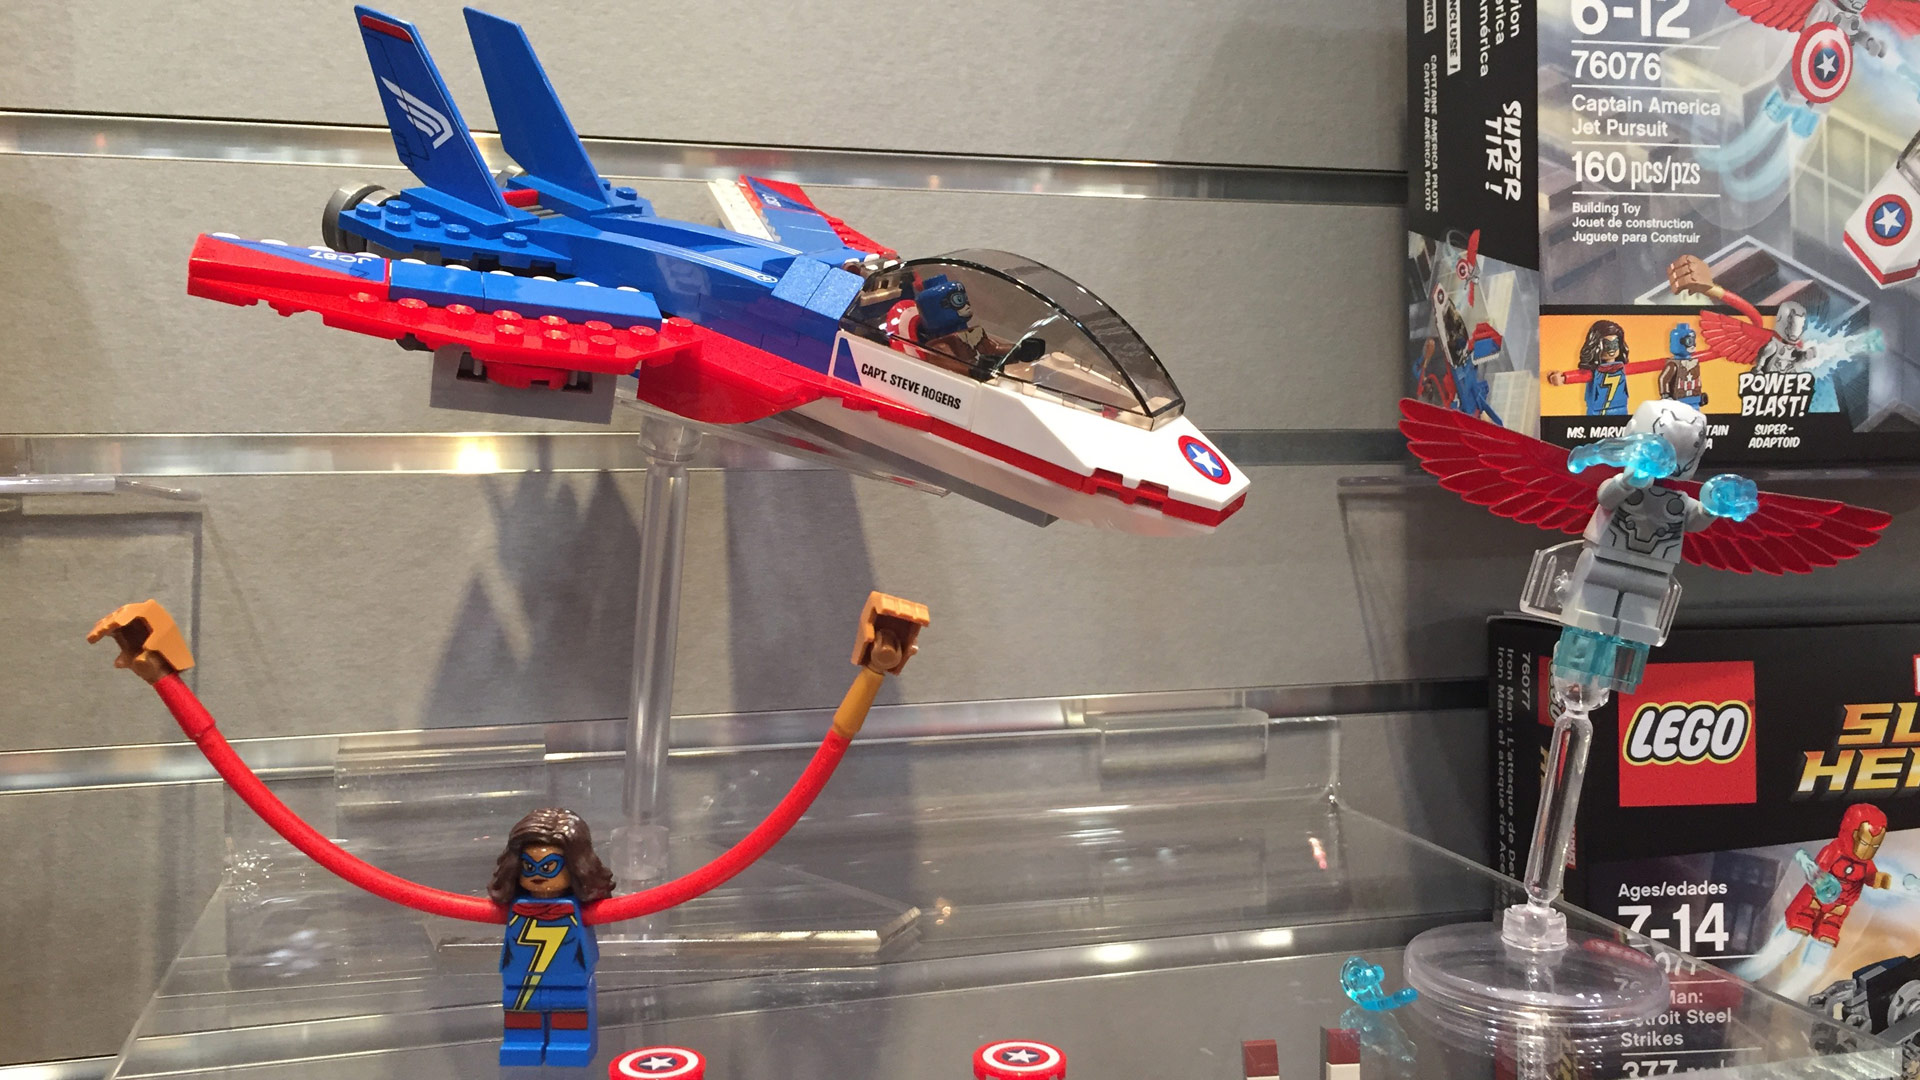 LEGO Marvel Super Heroes Set 76076 Captain America Jet Pursuit at Toy Fair 2017